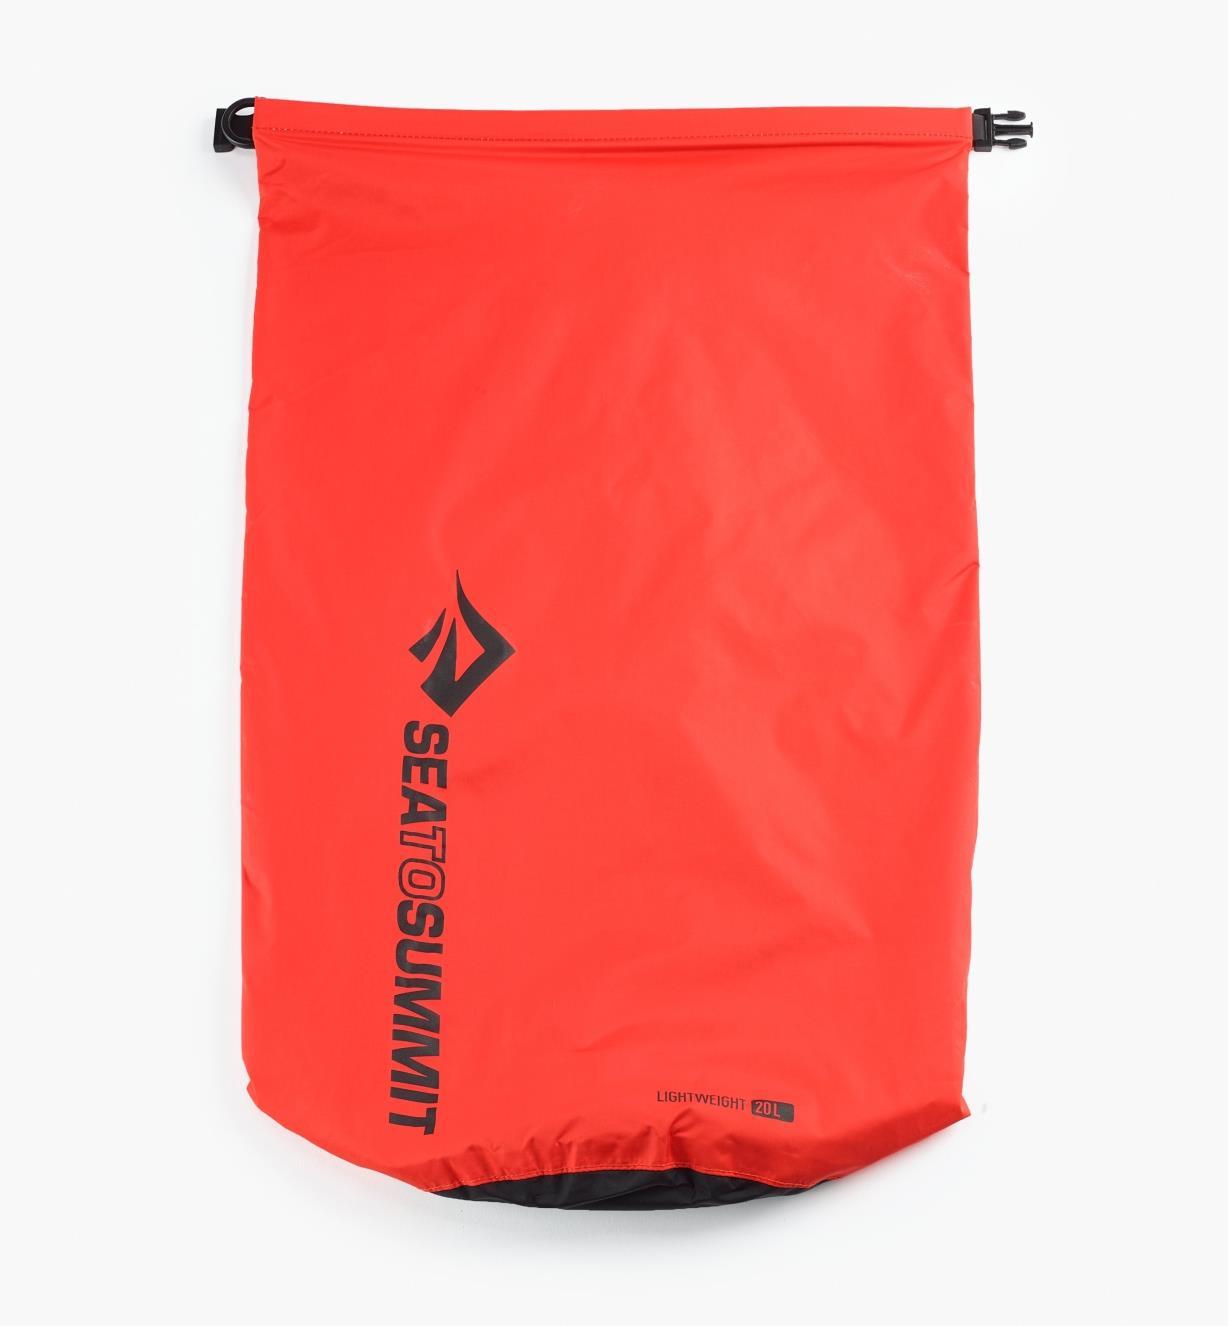 GB365 - 20 litre Dry Sack